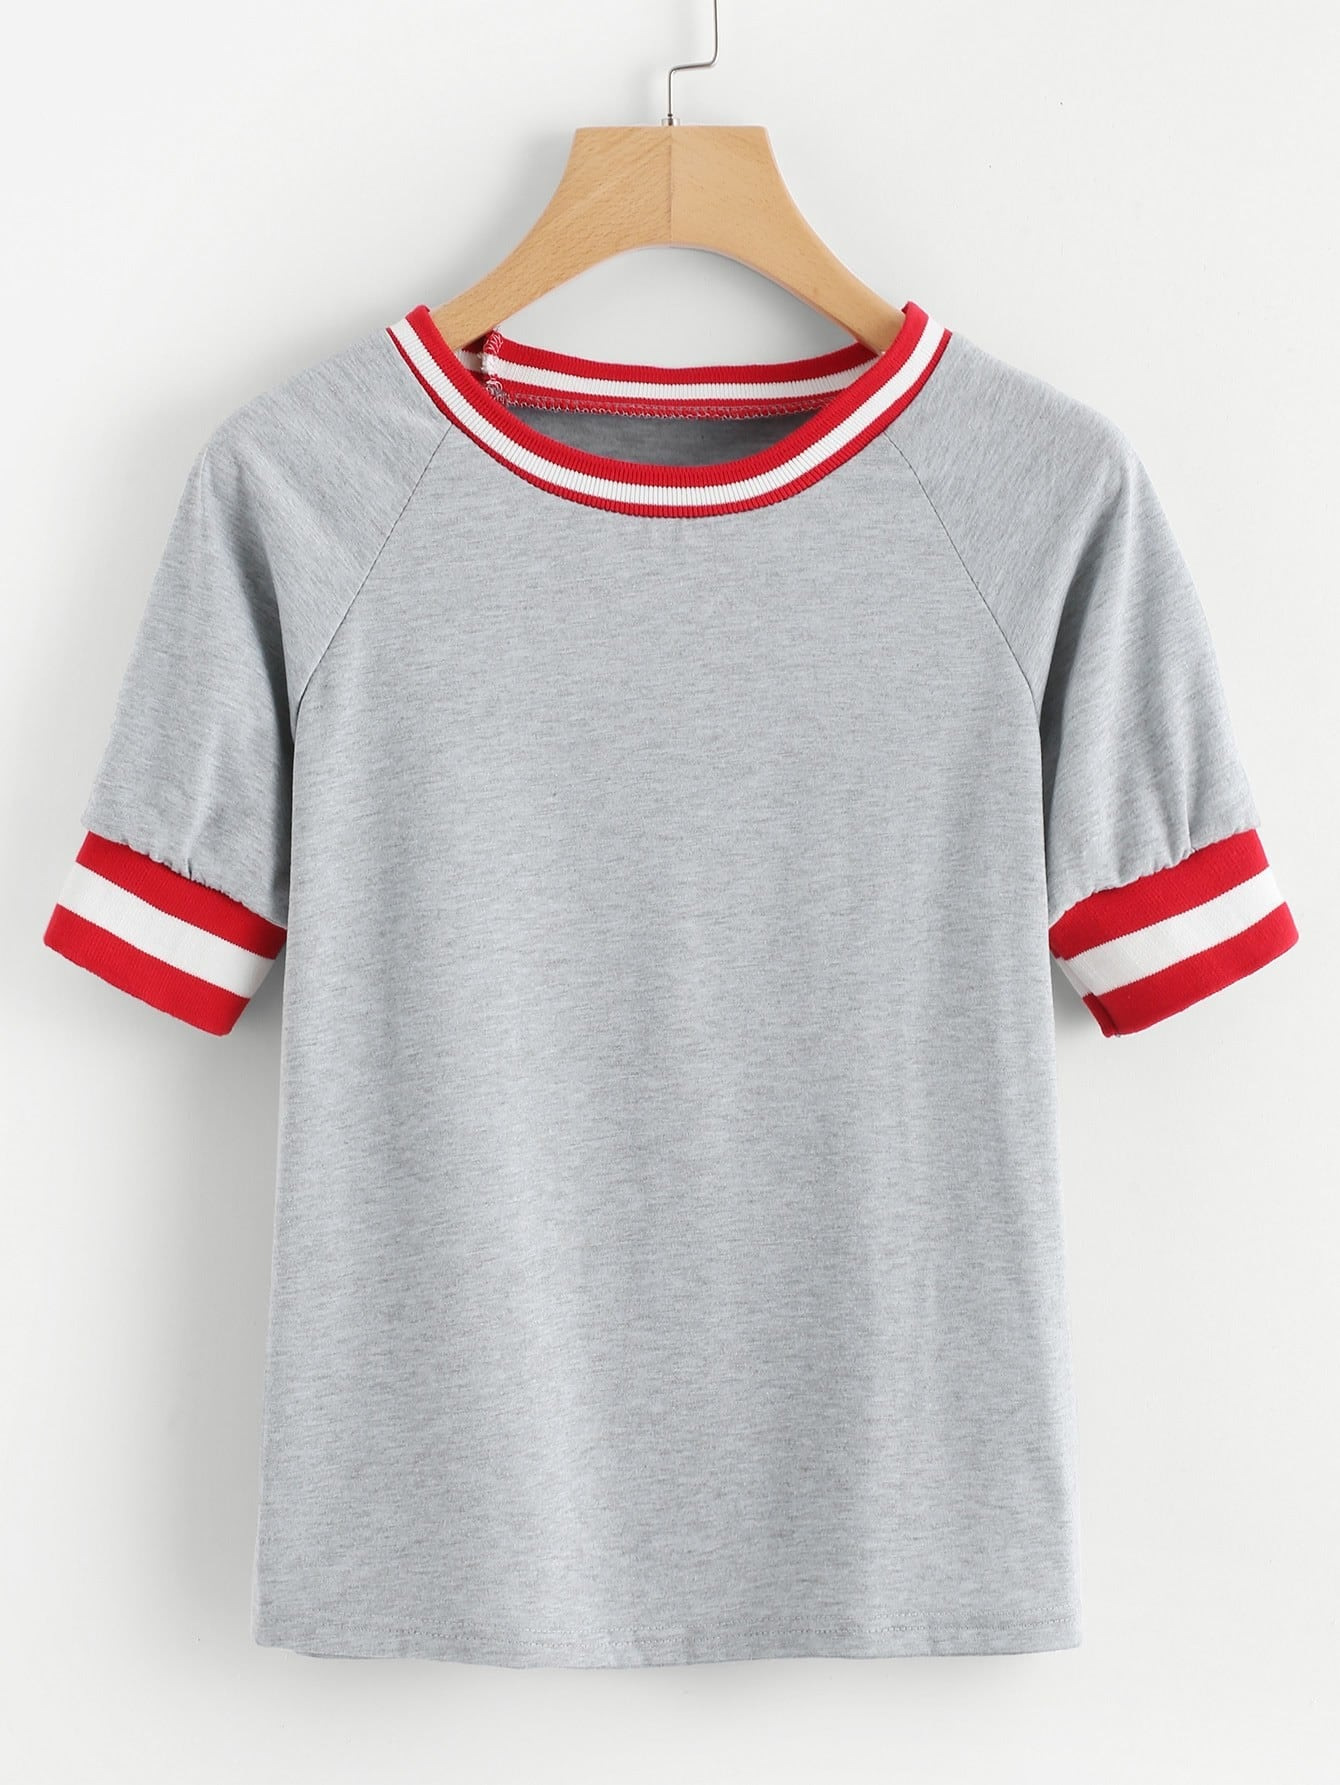 Фото Contrast Stripe Trim Raglan Sleeve Marled Tee men contrast stripe trim tee